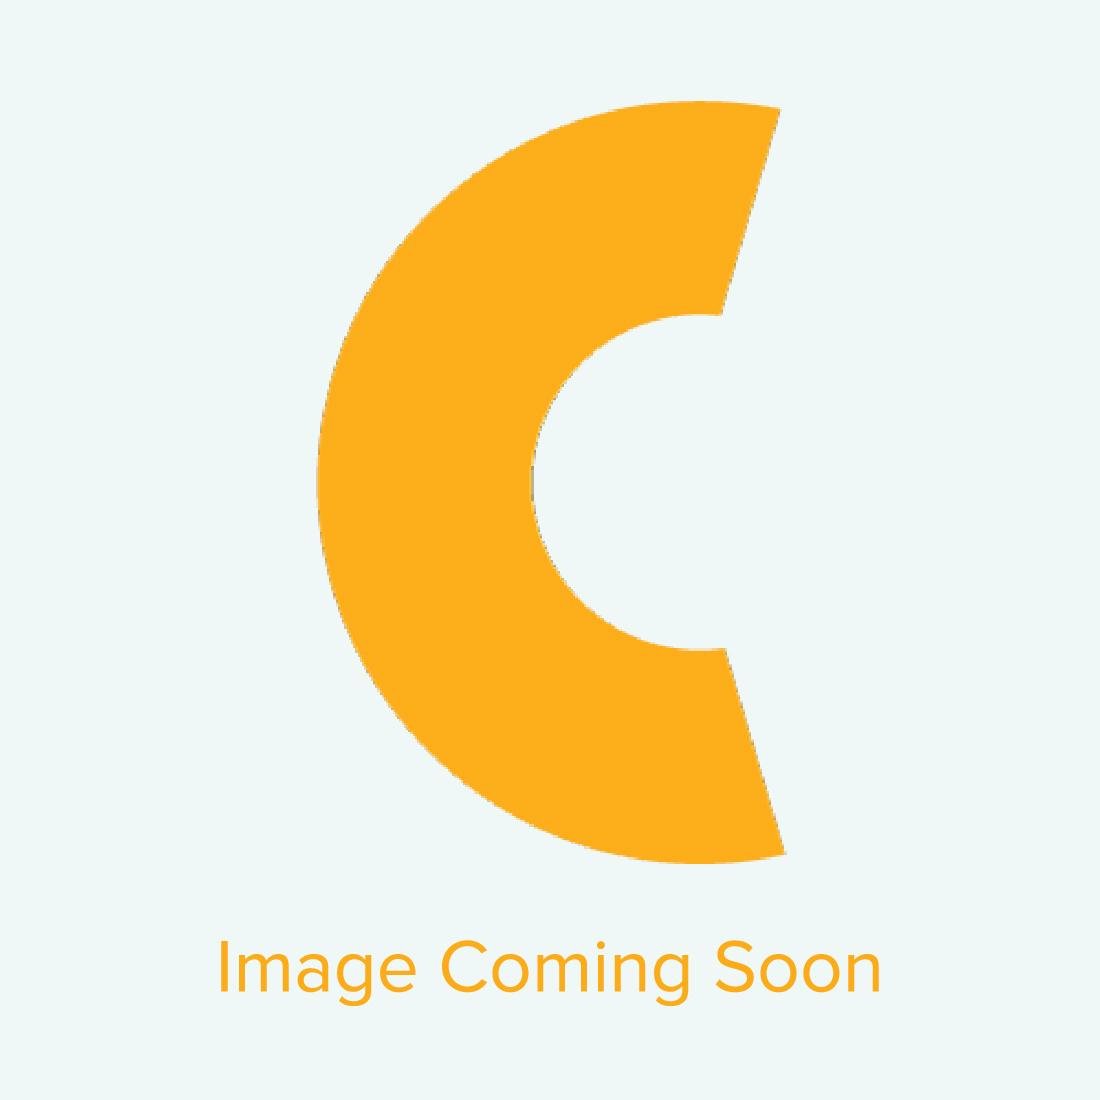 "14"" x 16"" Digital Combo Bottom Heat Fixture for Geo Knight Presses"